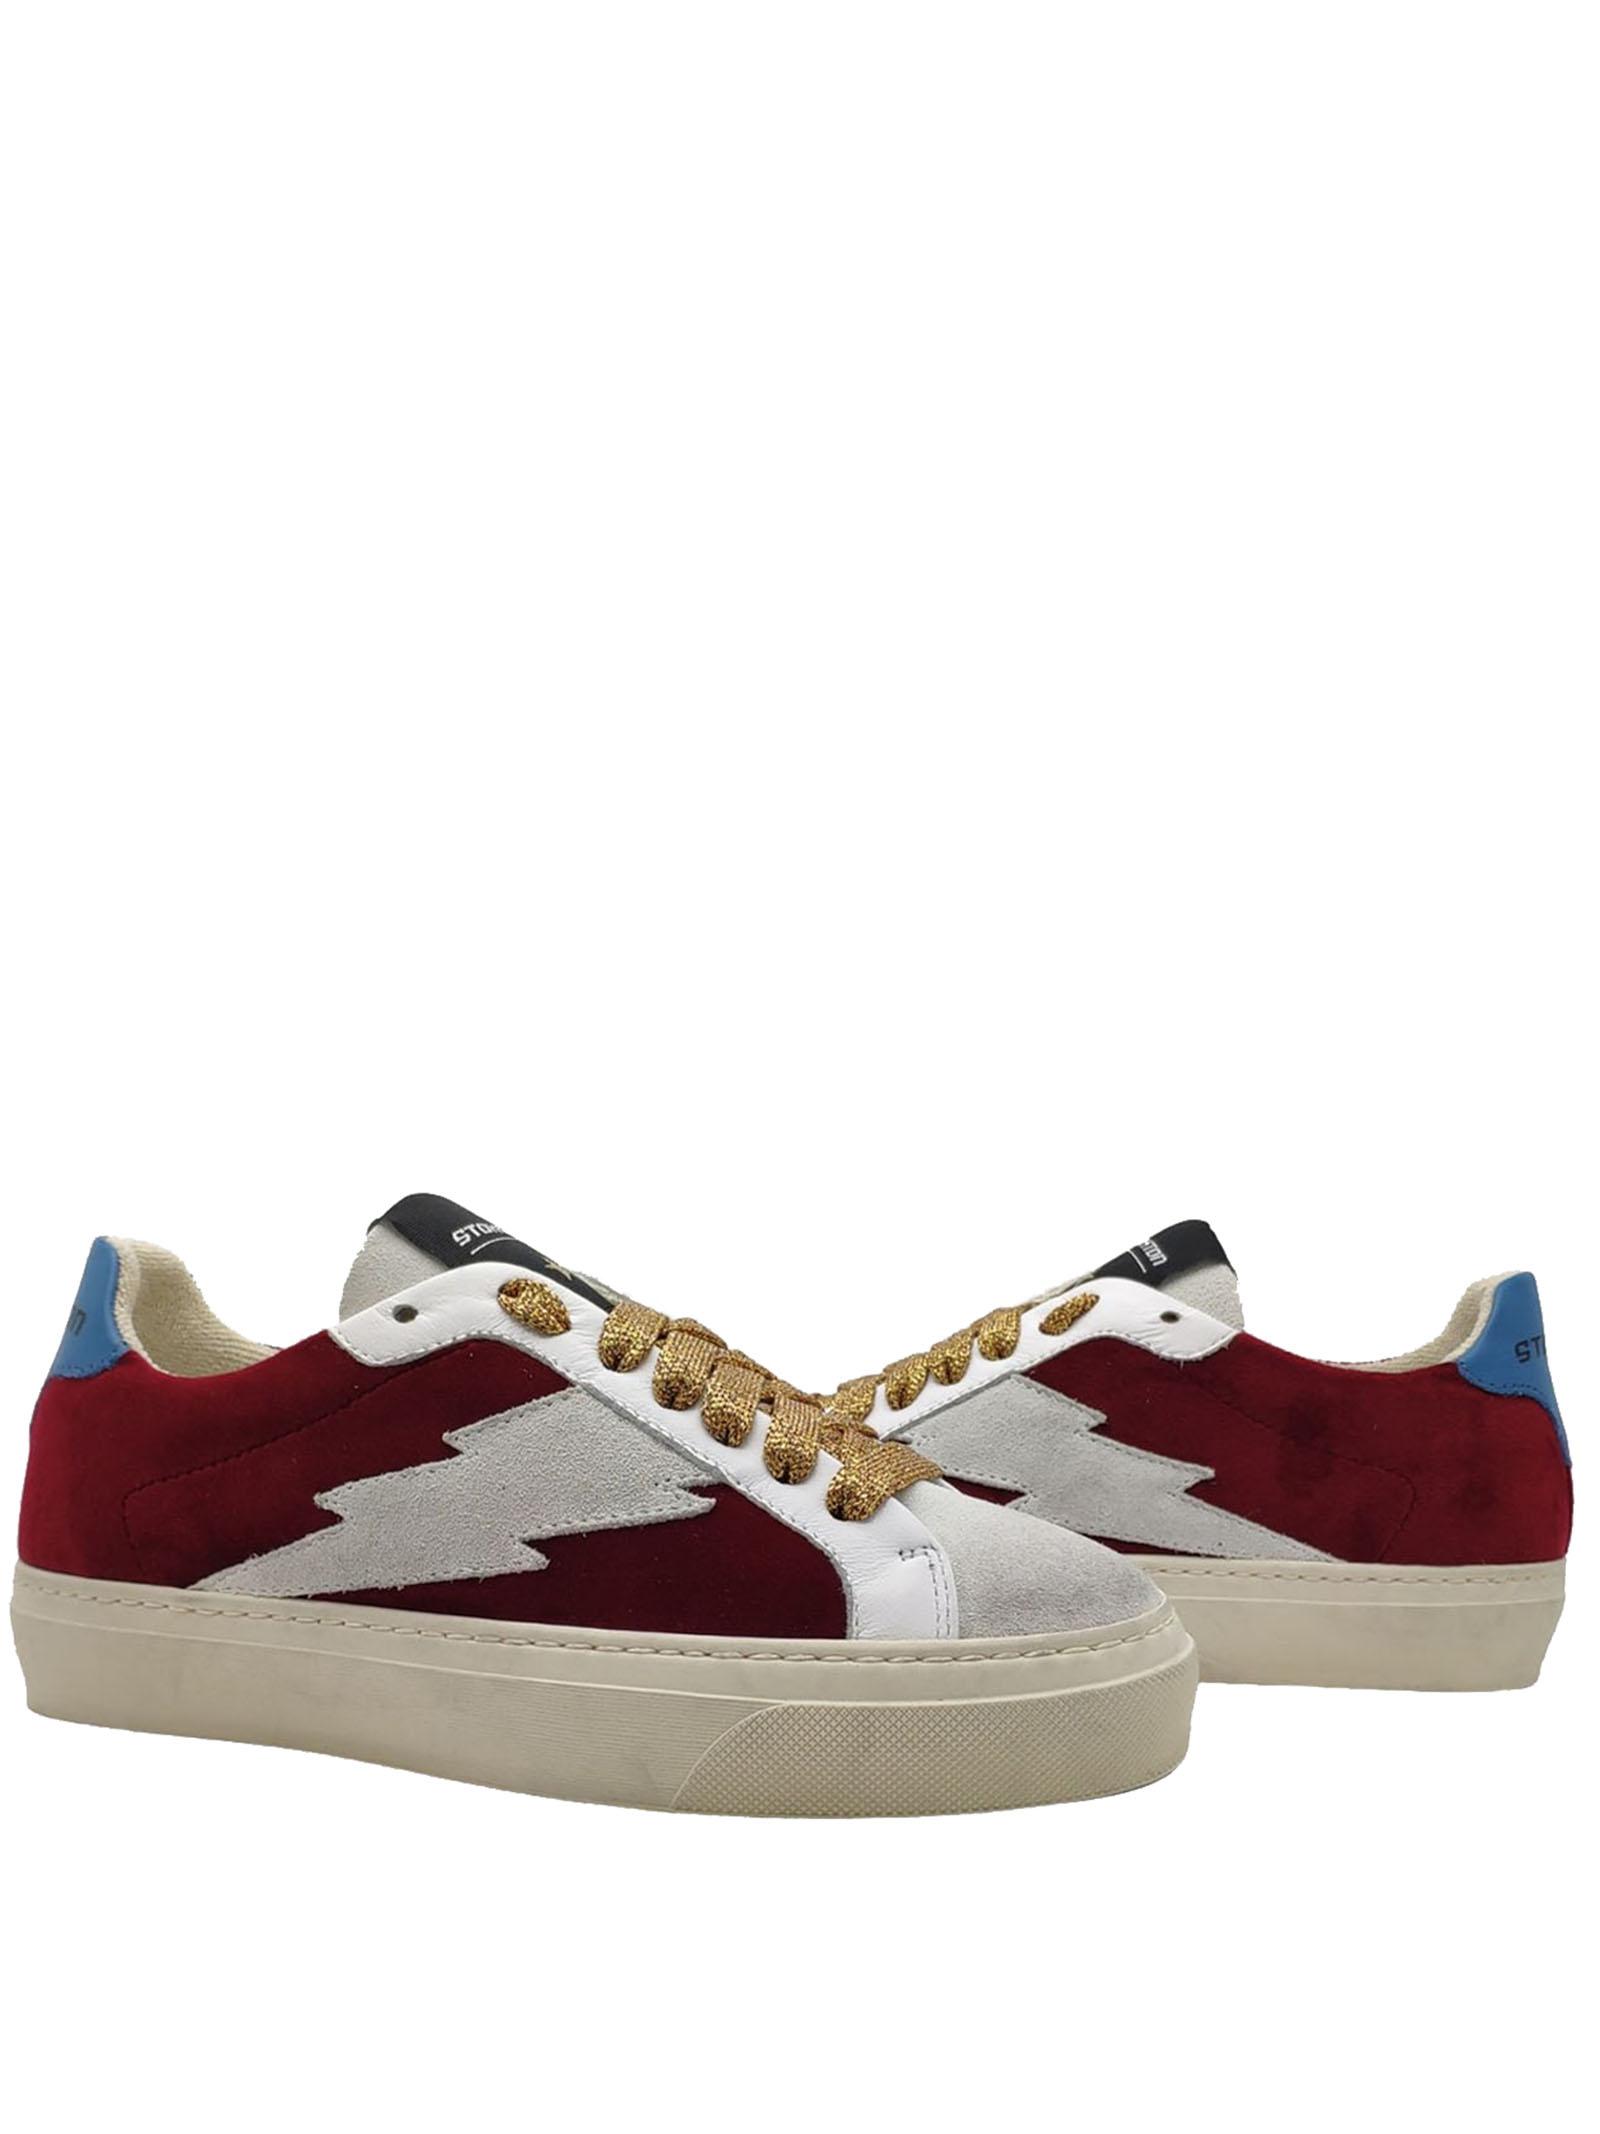 Women's Velvet Sneakers Stokton | Sneakers | BLAZE-DBORDEAU